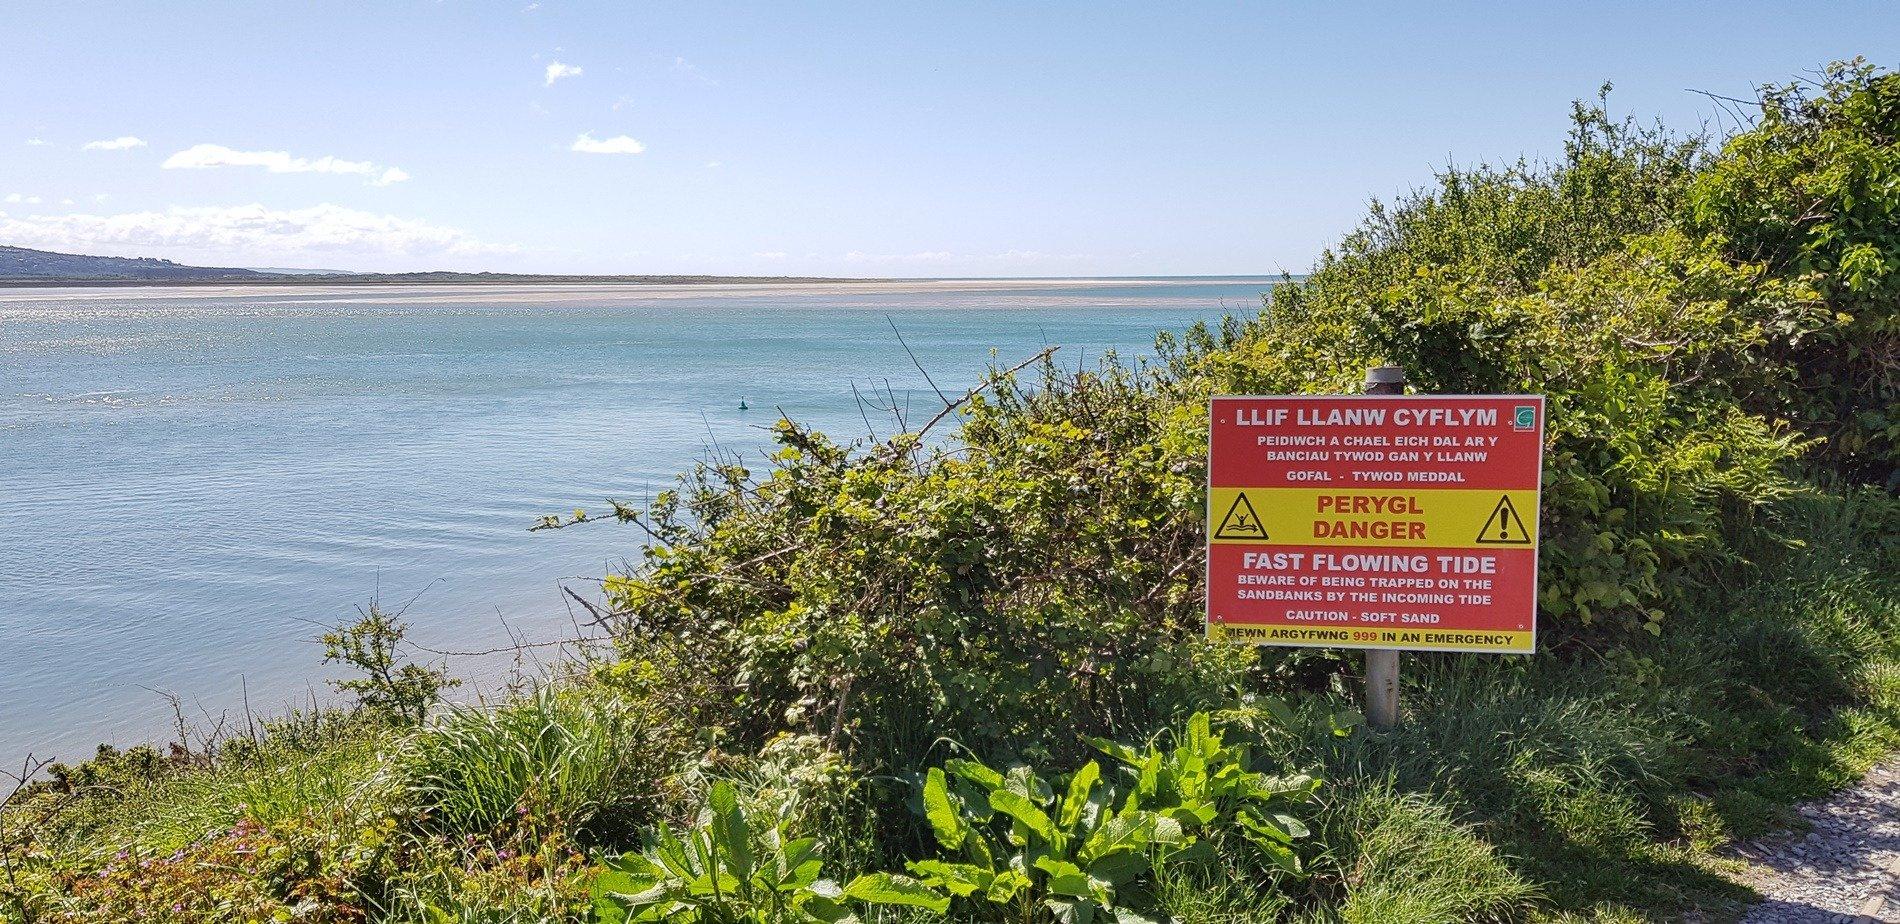 Wales Coast Path Safety